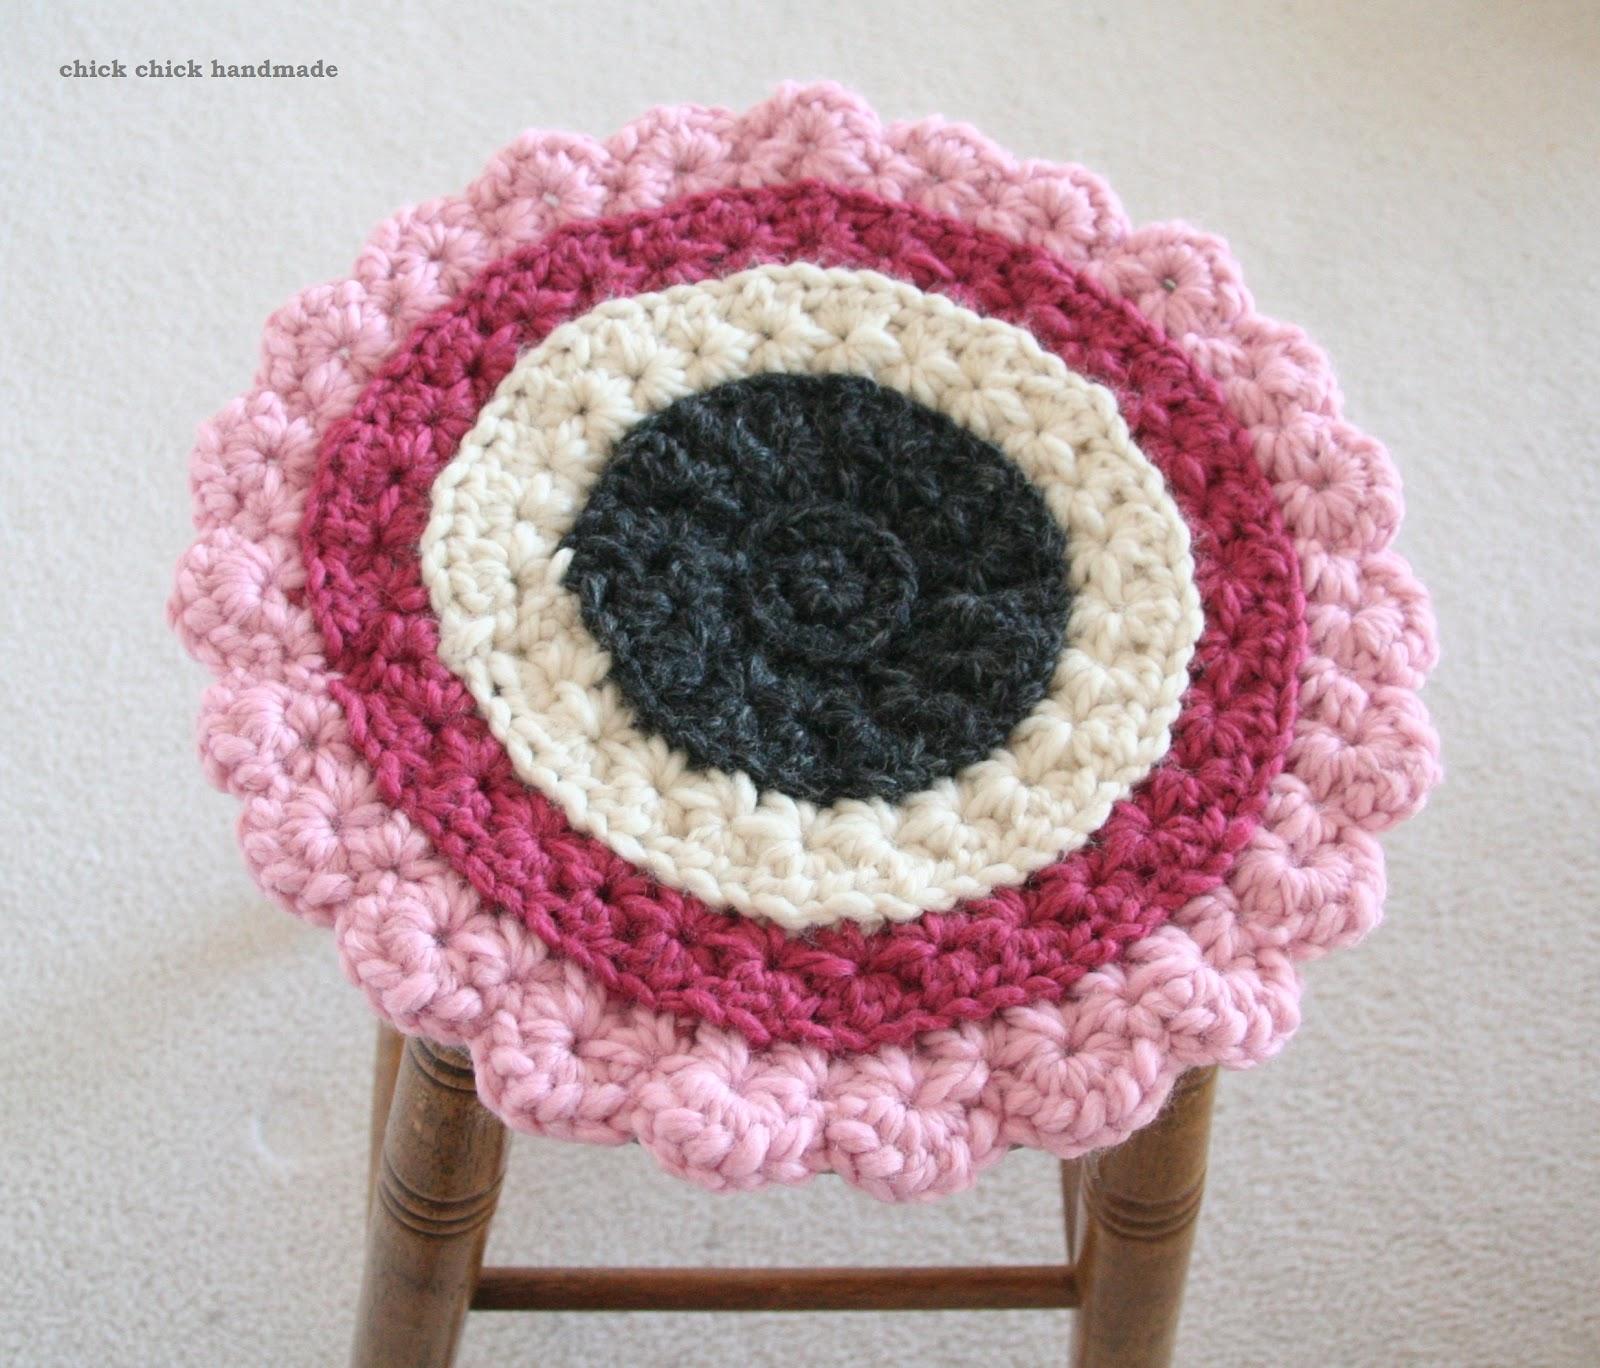 chick chick sewing: Crochet star stitches seat cushion